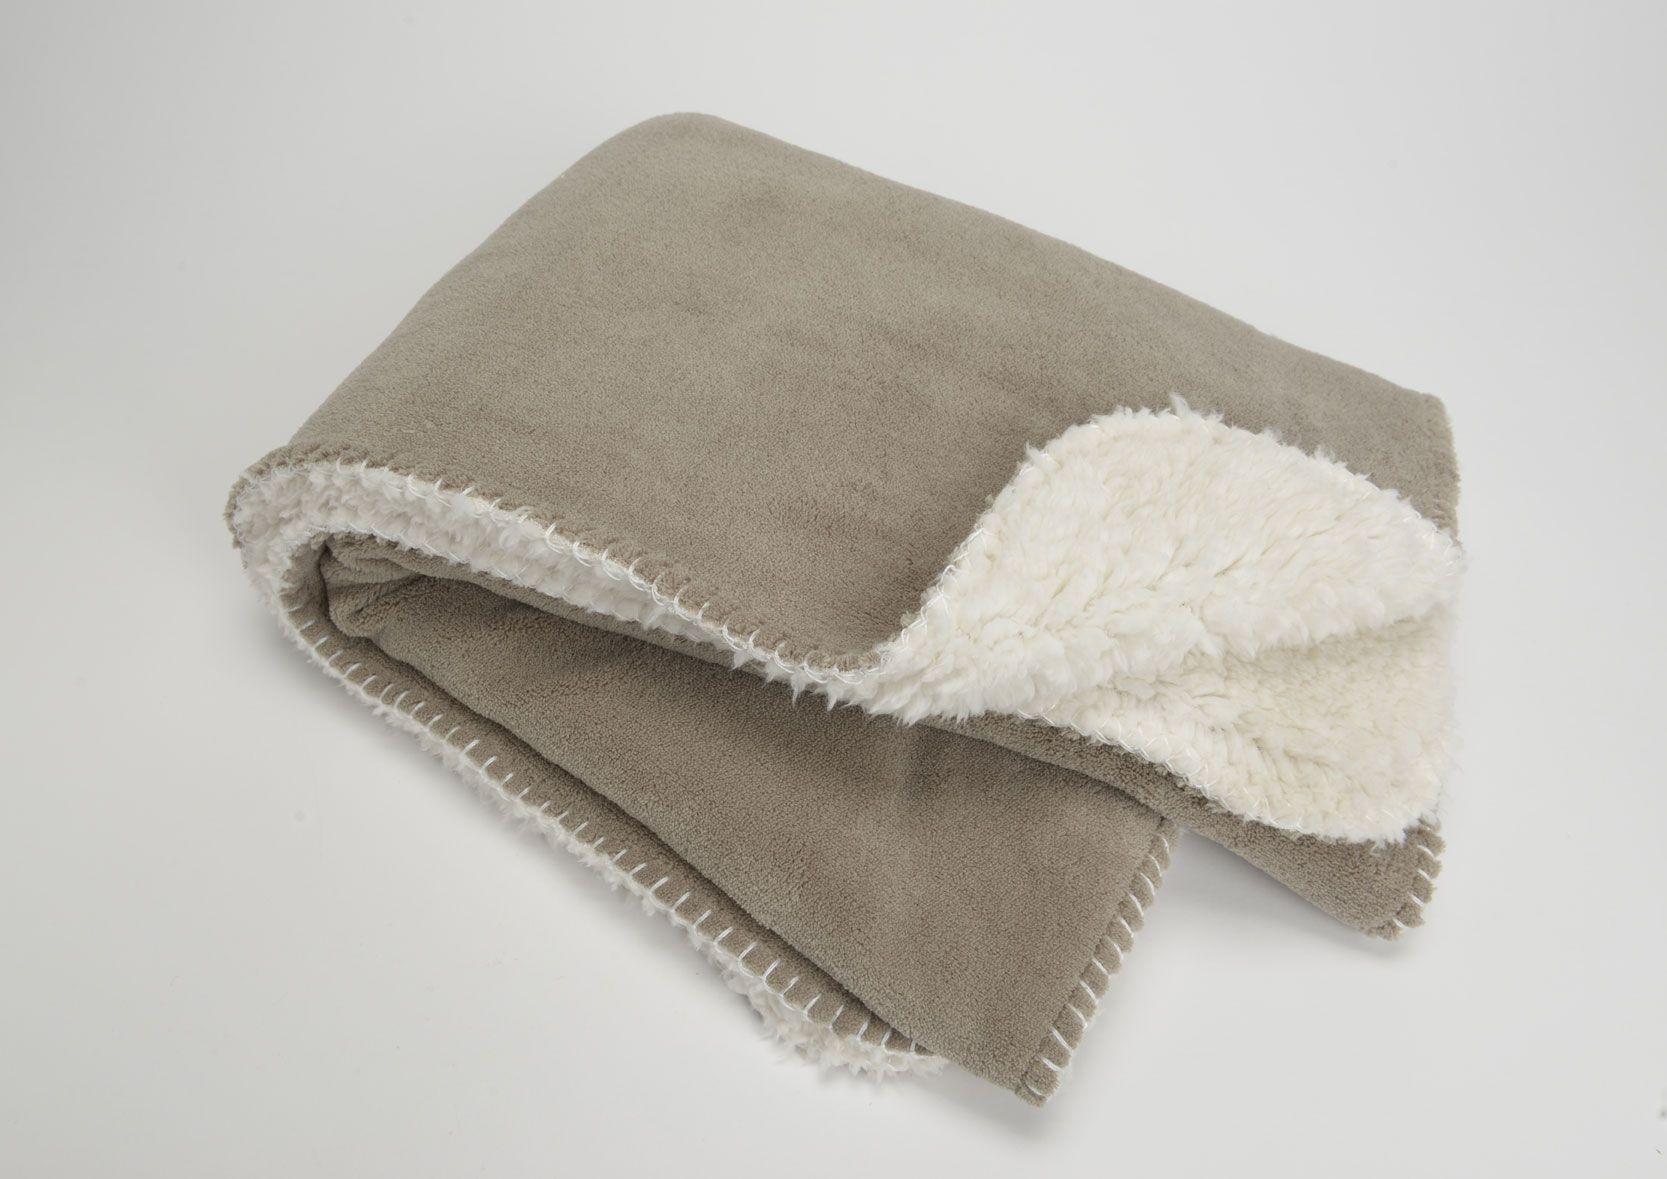 plaid cocoon couleur taupe. Black Bedroom Furniture Sets. Home Design Ideas